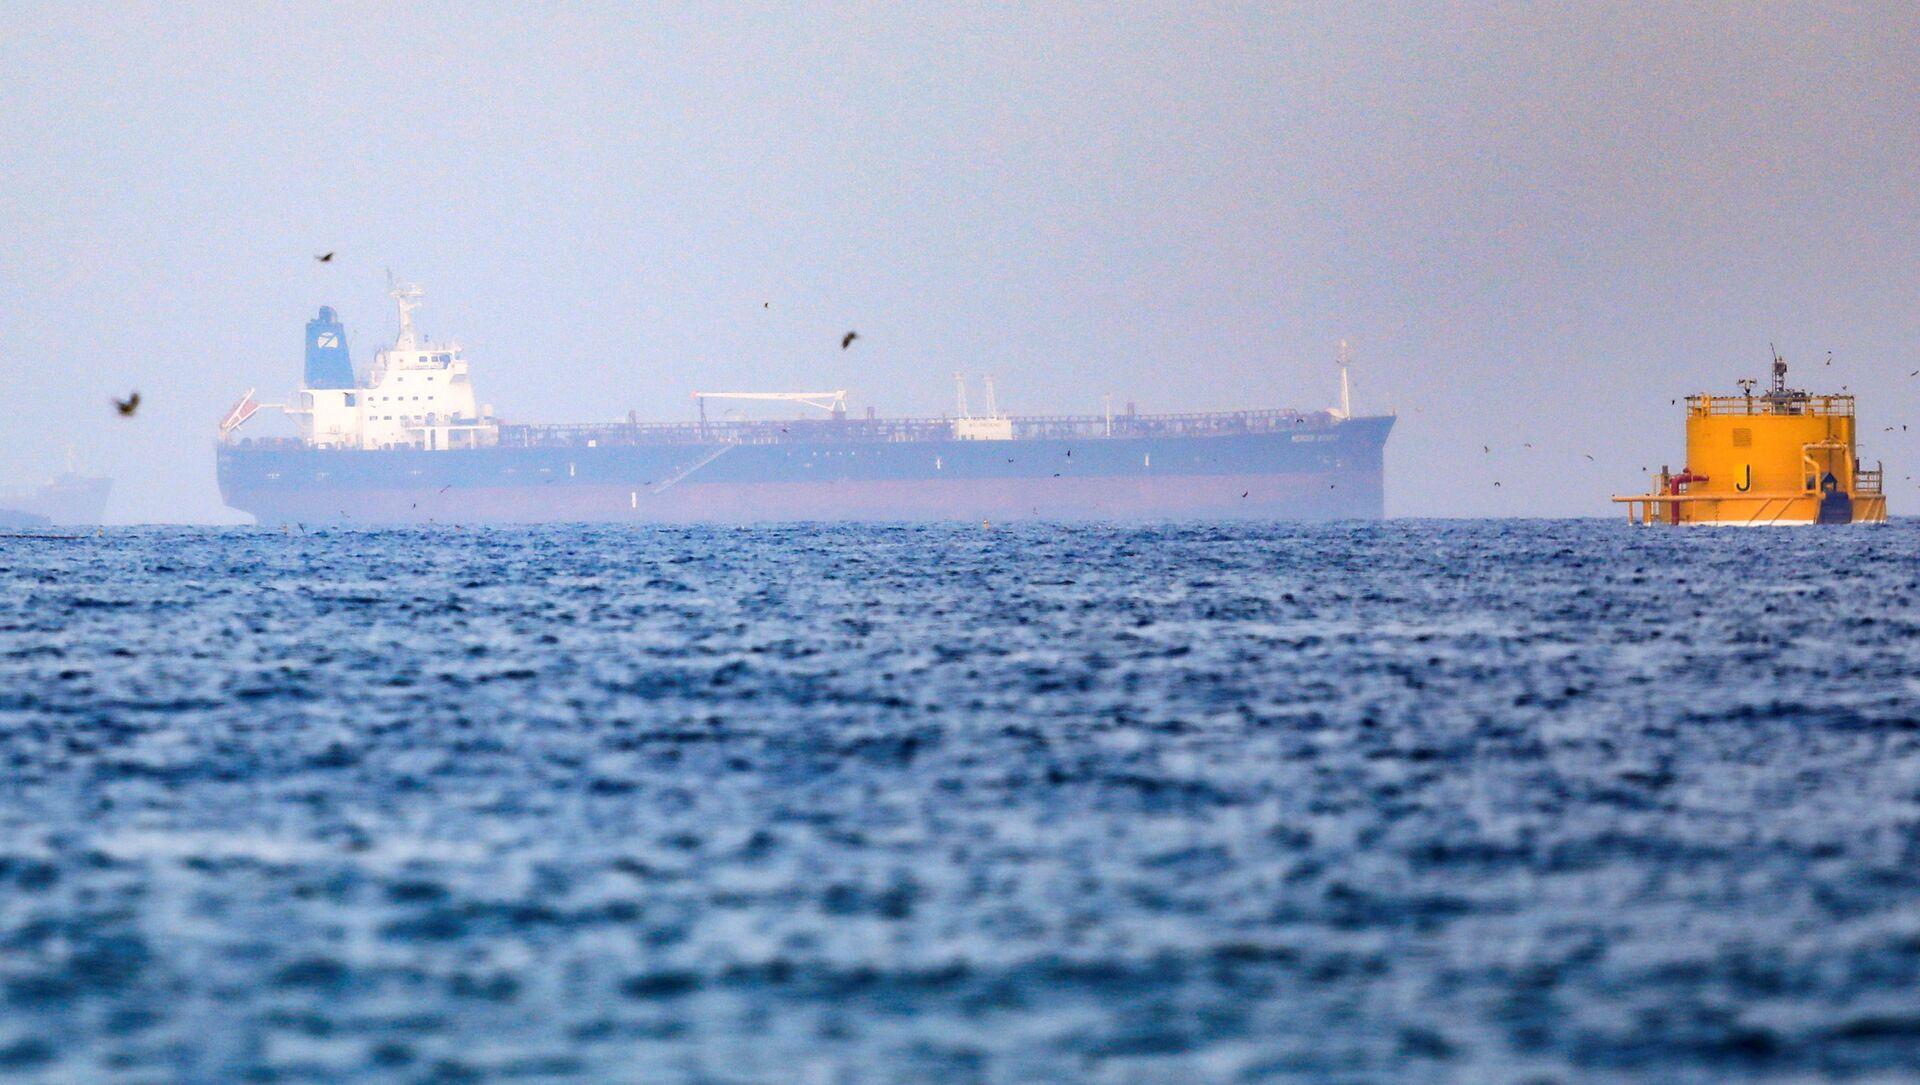 Mercer Street, an Israeli-managed oil tanker that was attacked off the coast of Oman, is seen near Fujairah Port in United Arab Emirates, August 3, 2021. - Sputnik International, 1920, 05.08.2021